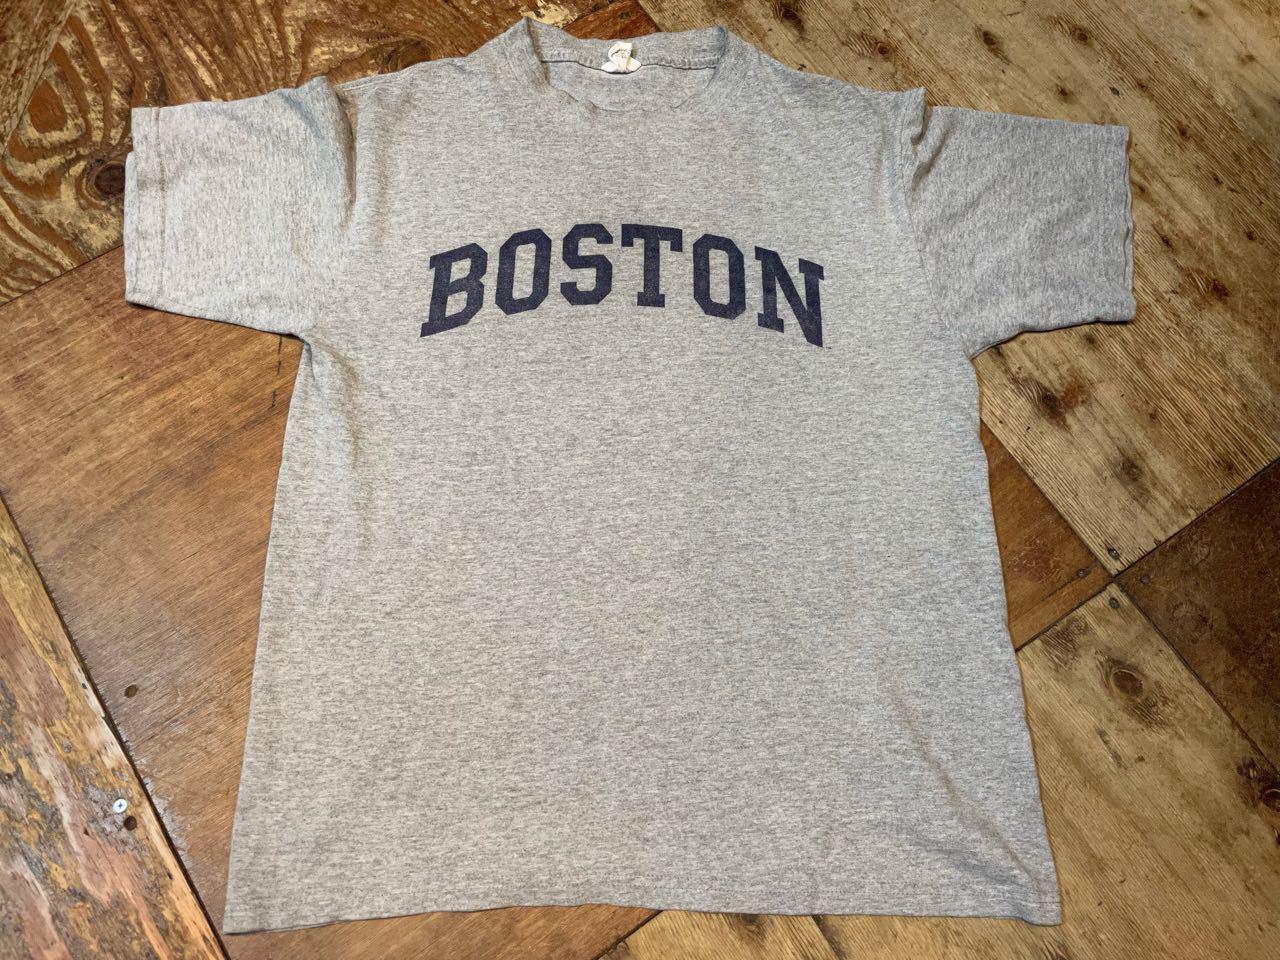 6月12日(土)入荷!80s Made in U.S.A the cotton exchange  BOSTON UNIVERSITY Tシャツ!_c0144020_13315251.jpg